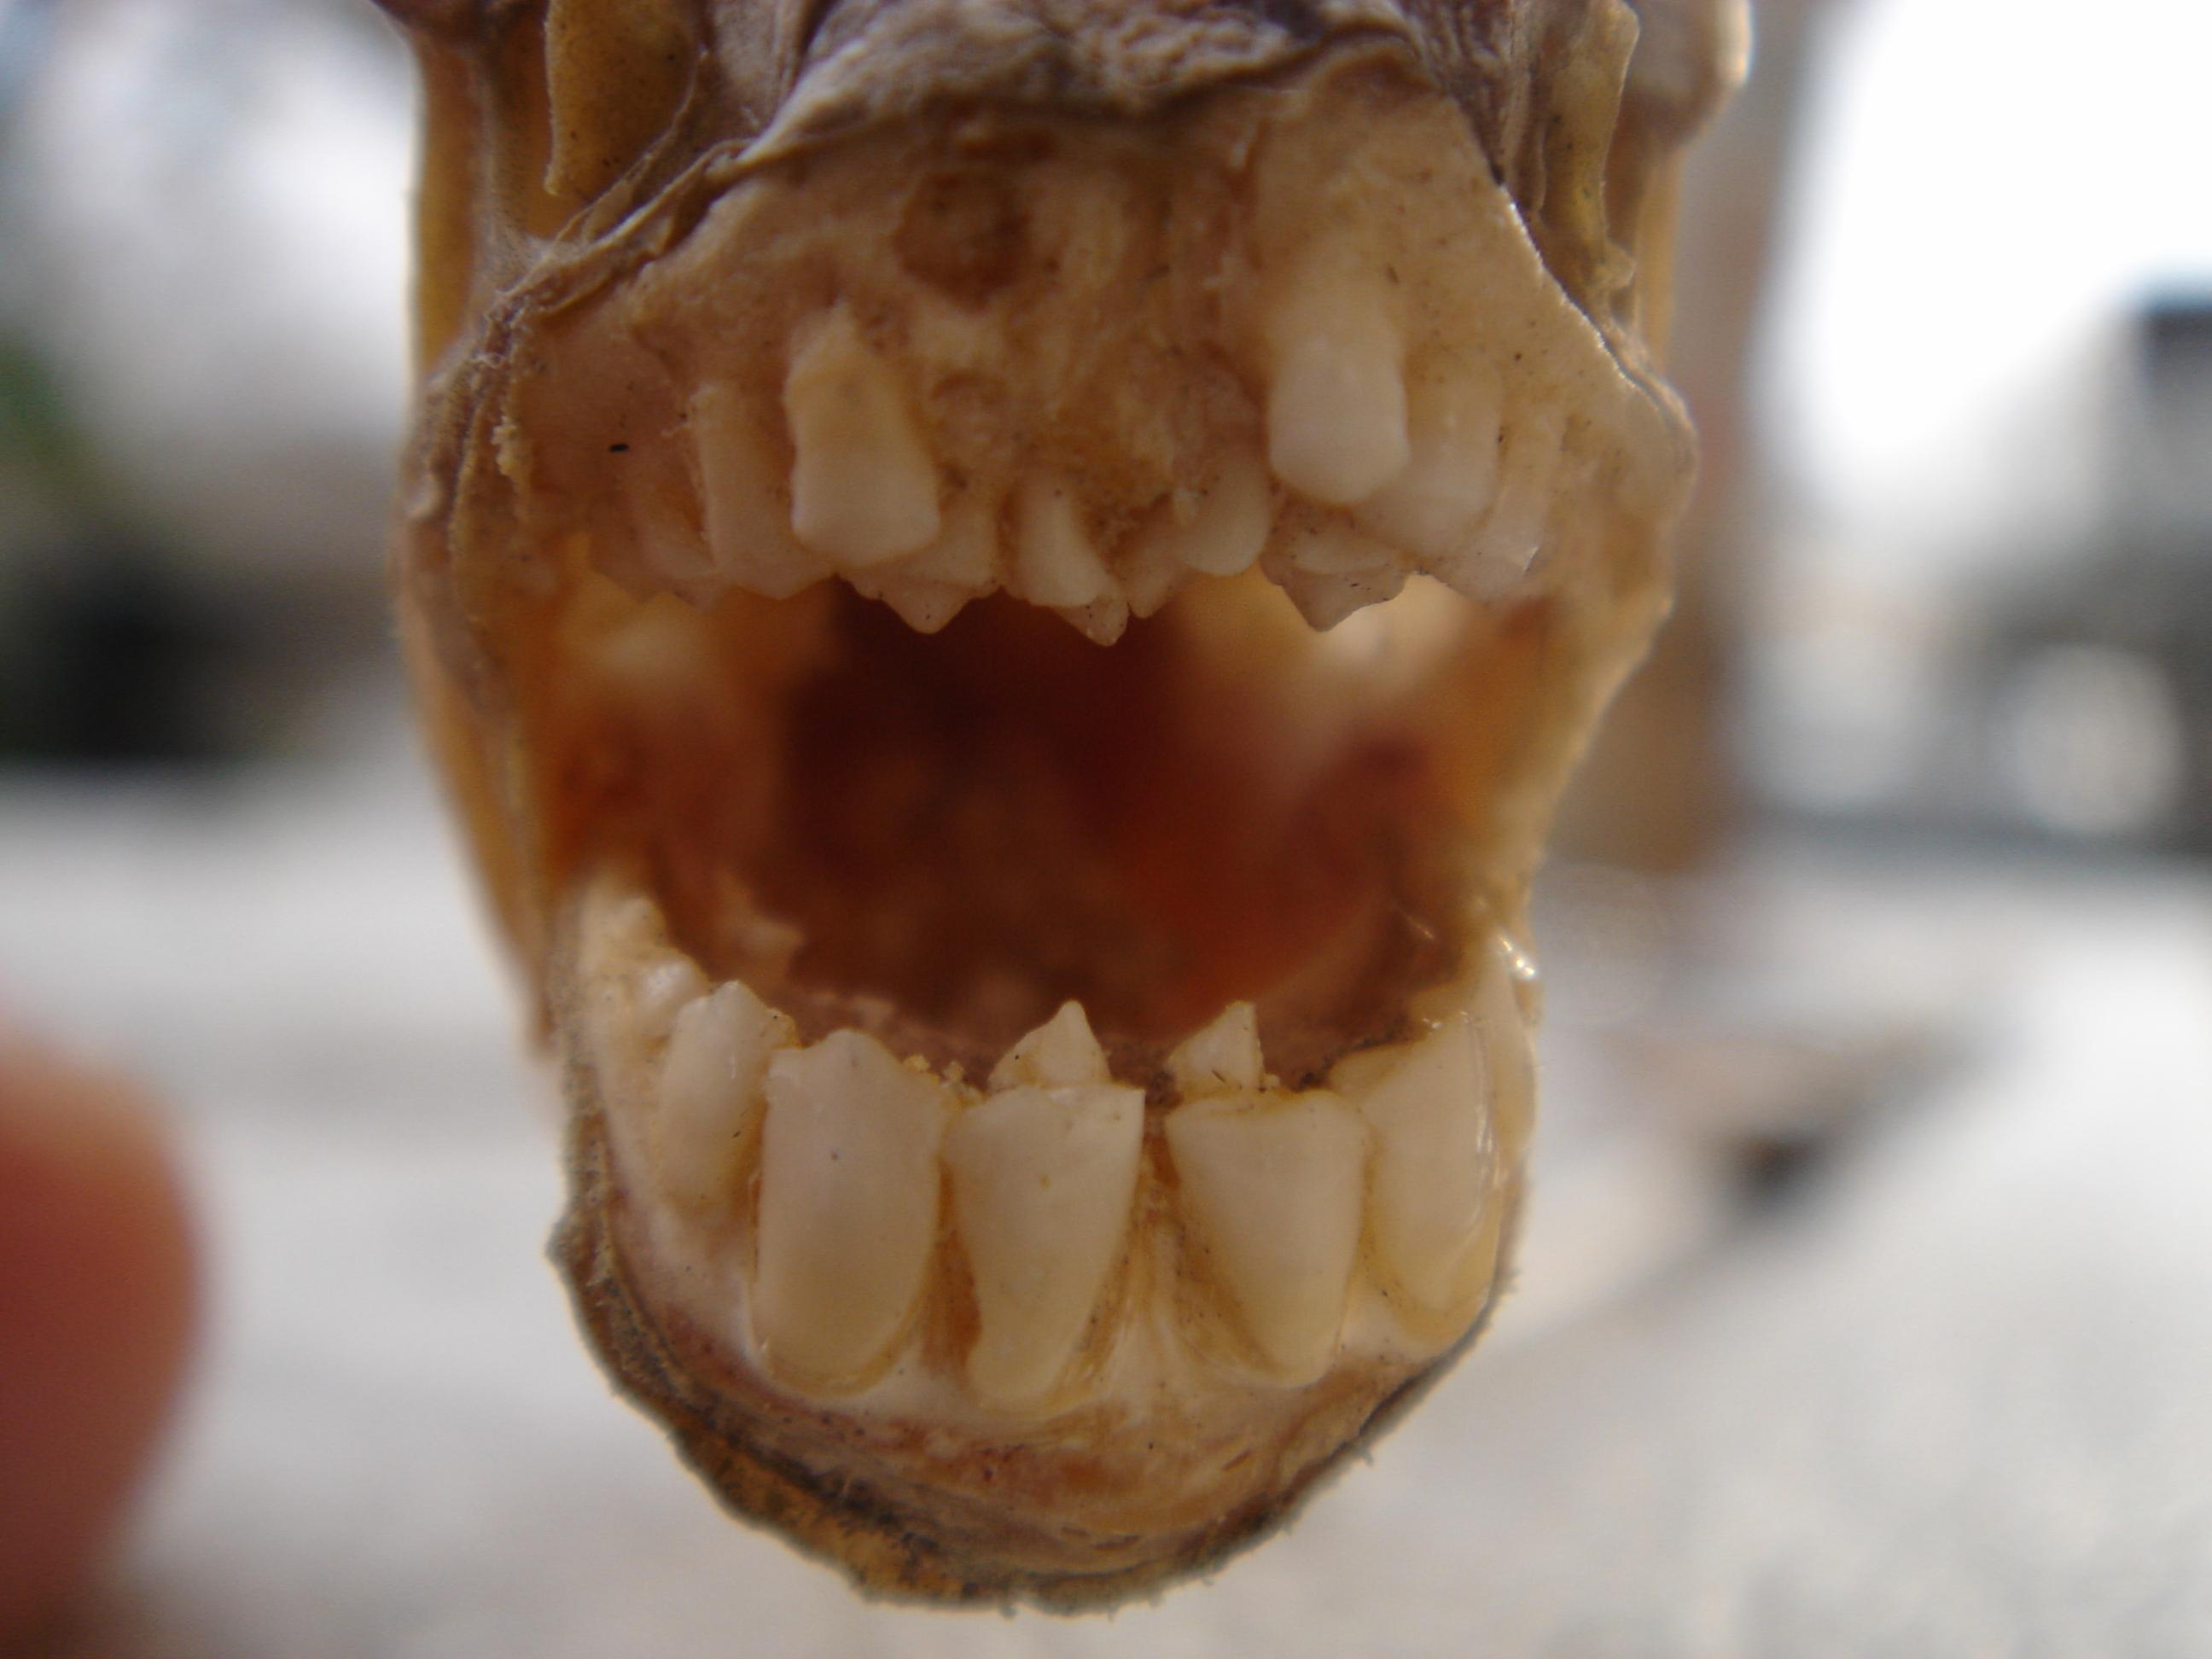 Pics for pacu fish teeth for Pacu fish teeth